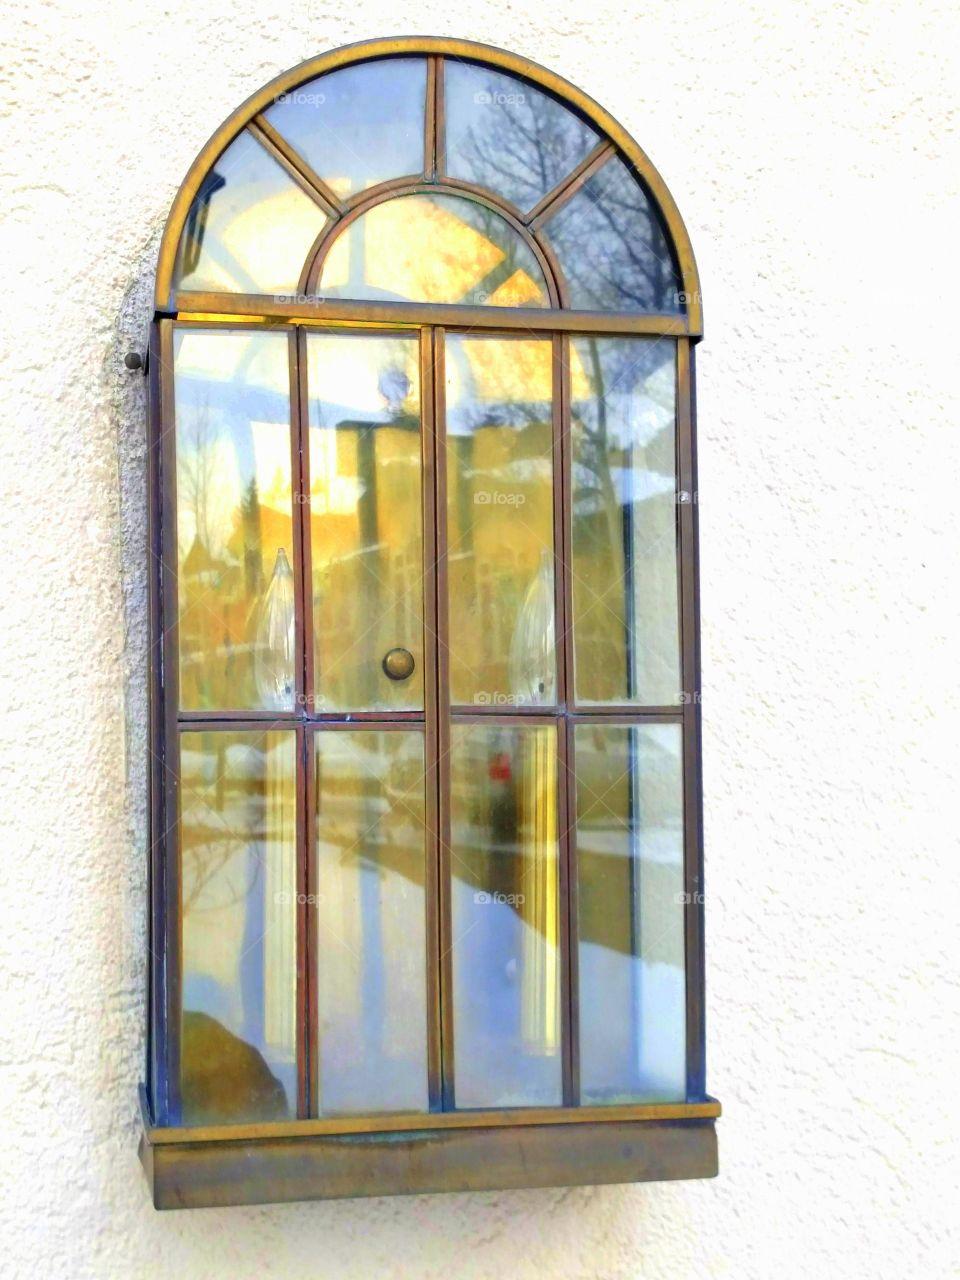 Gaslight Reflection